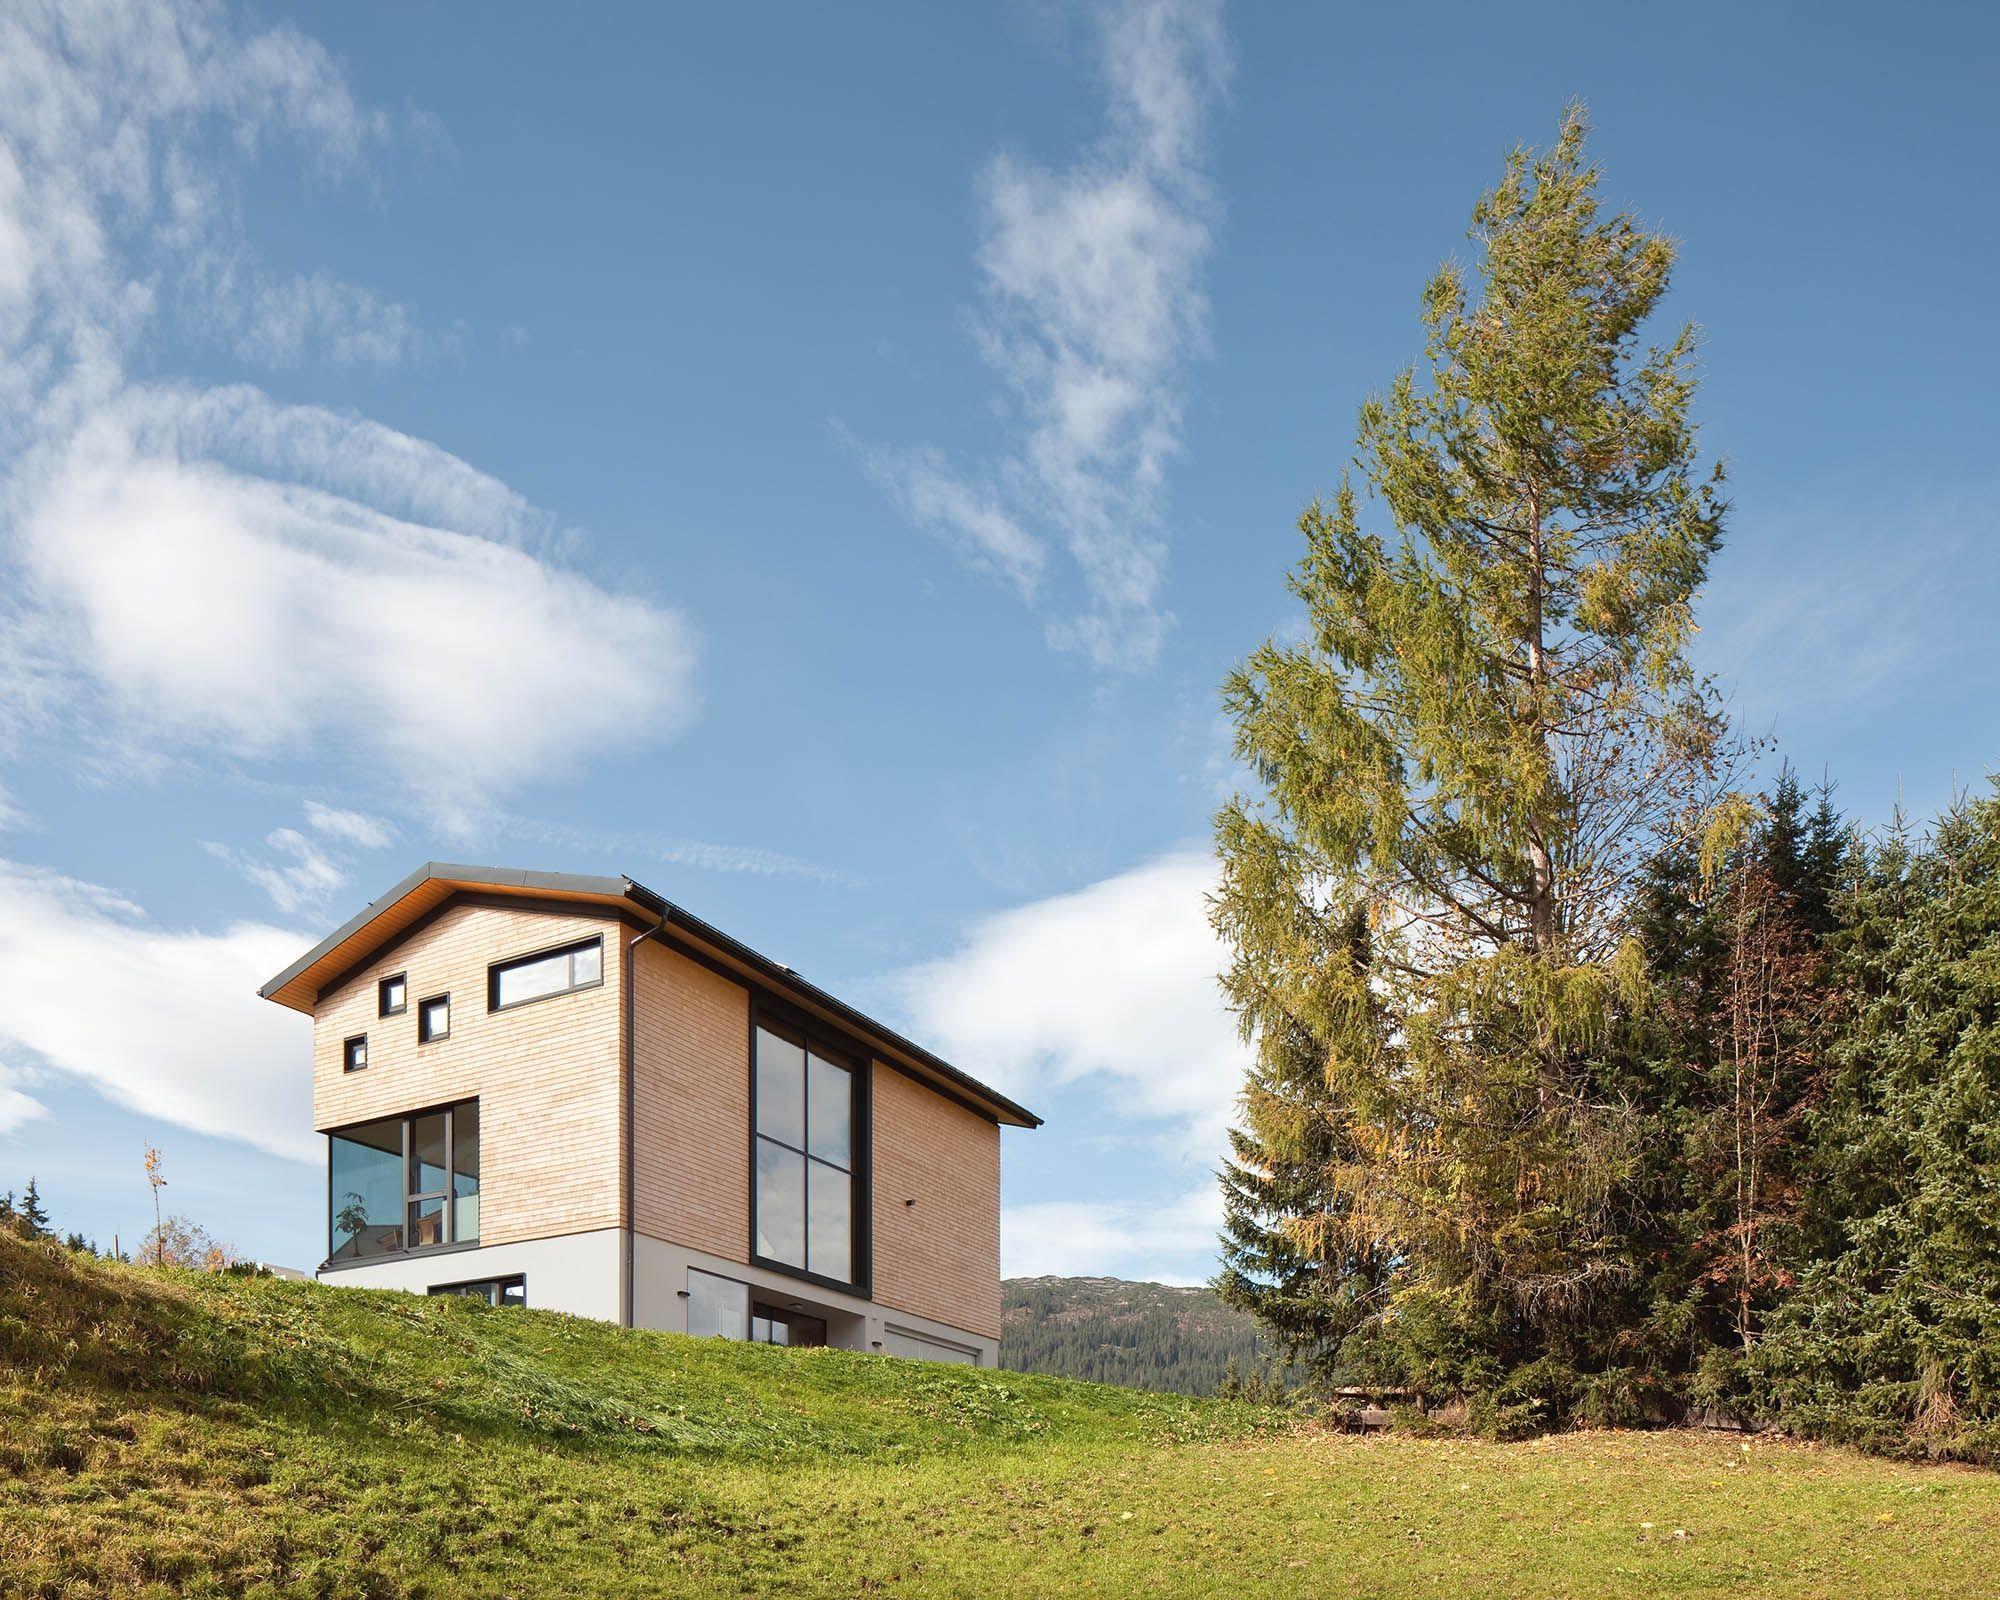 Haus E / pfanzelt architekten